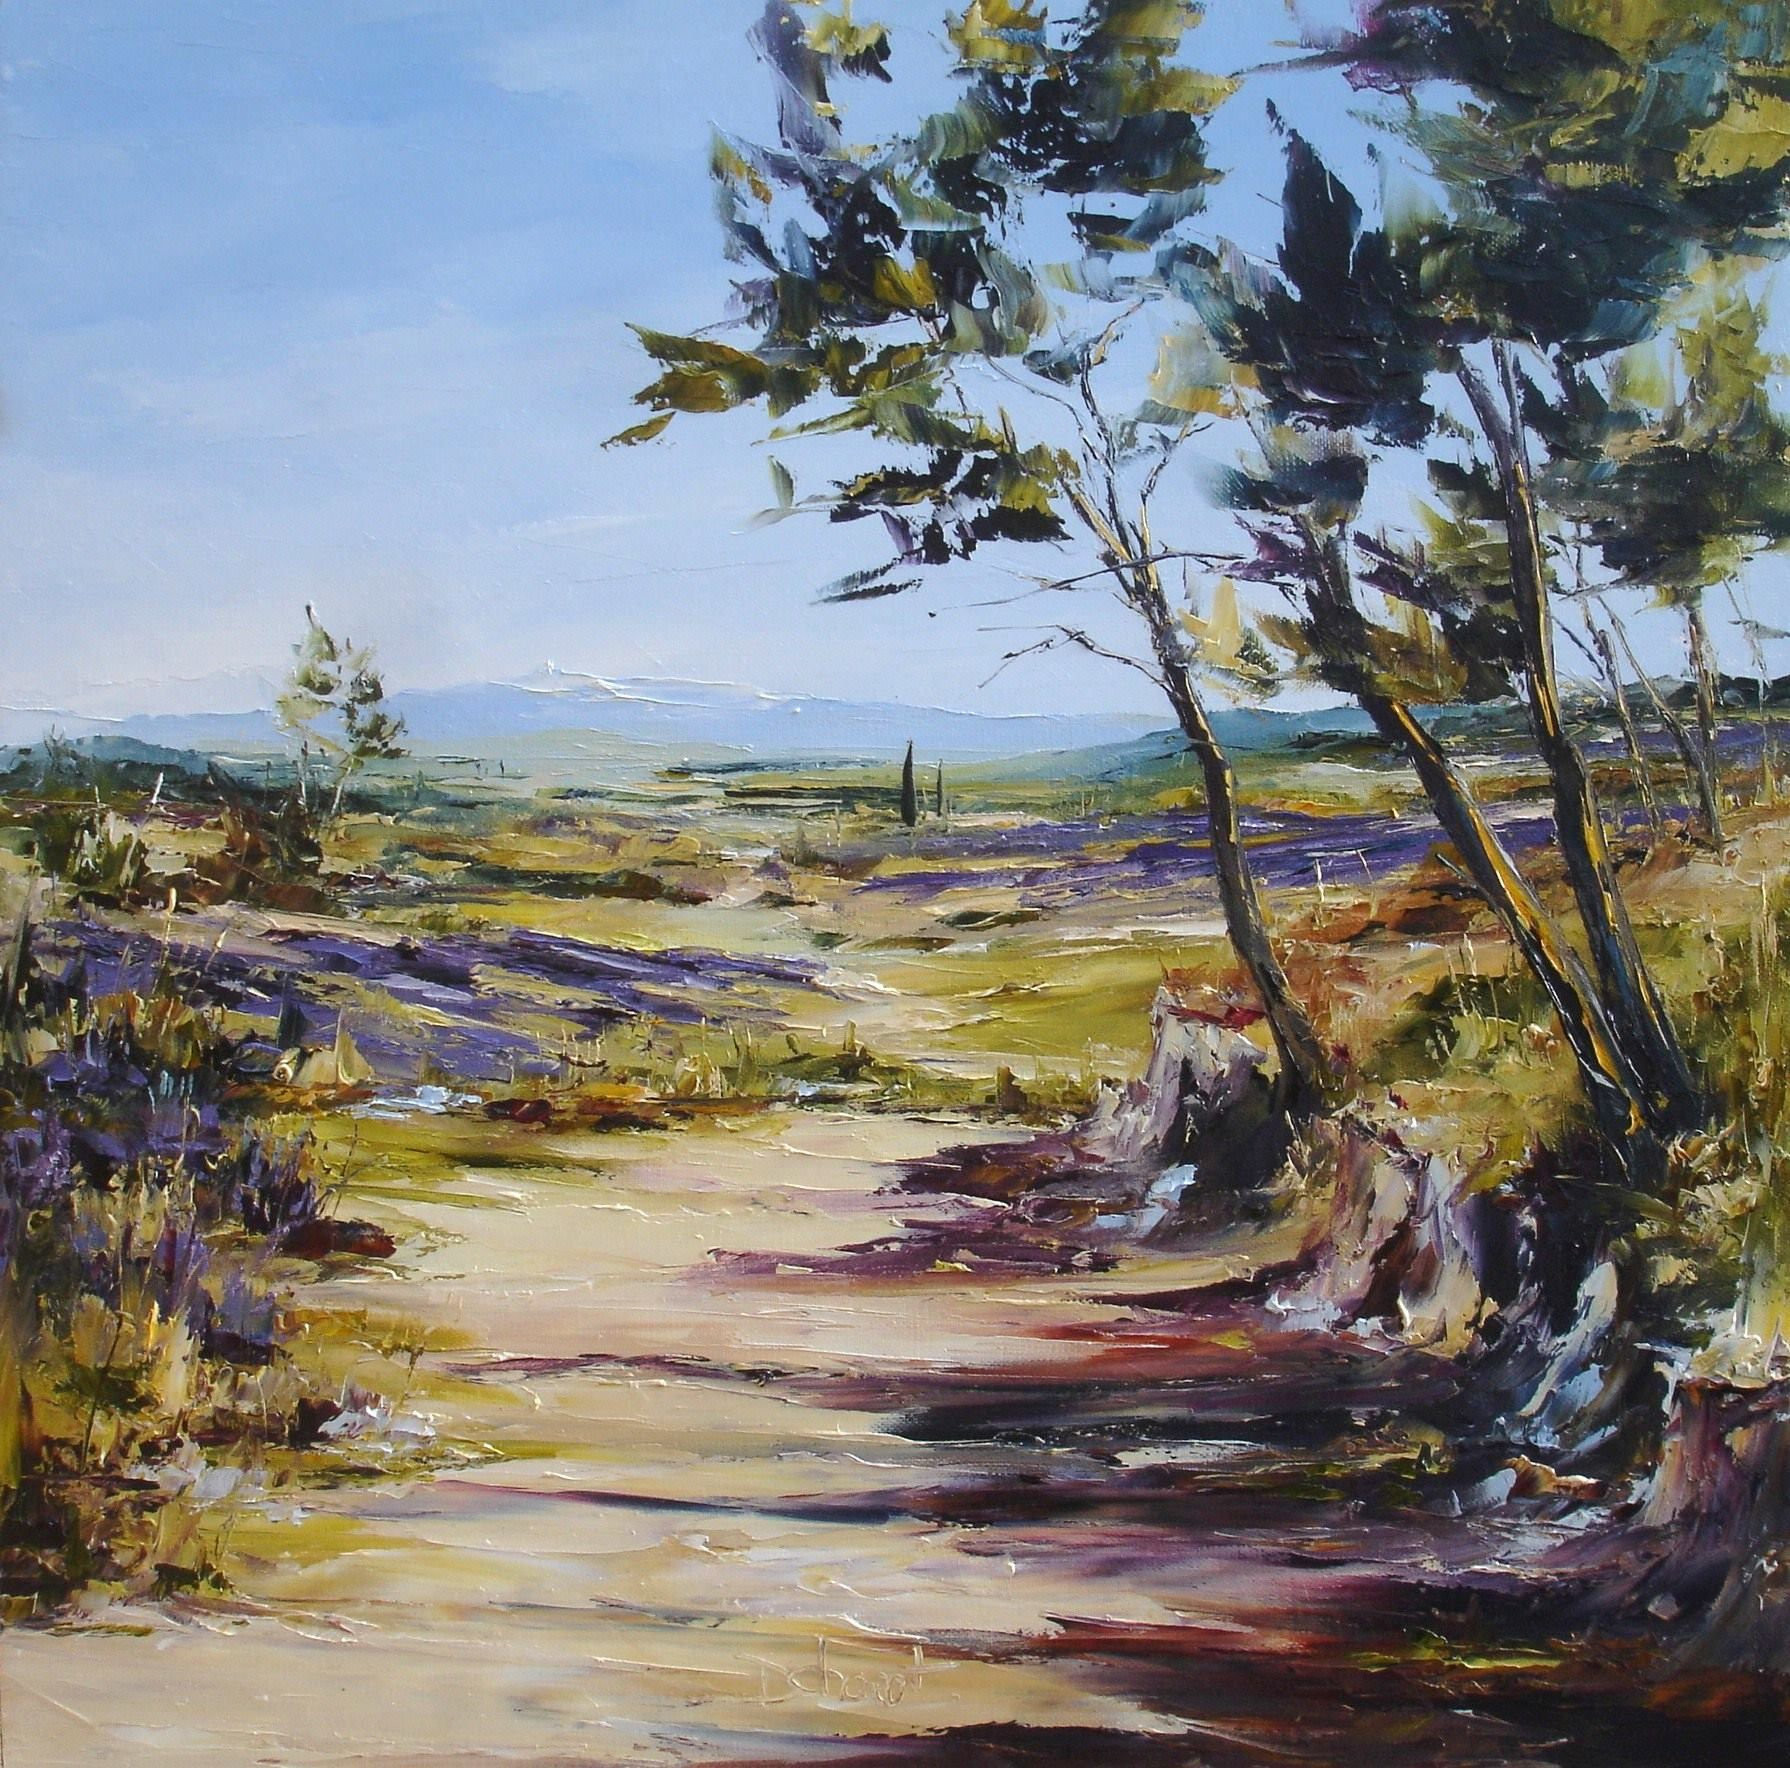 Denis Cheret Peinture Paysage Peinture Dessin Artiste Peintre